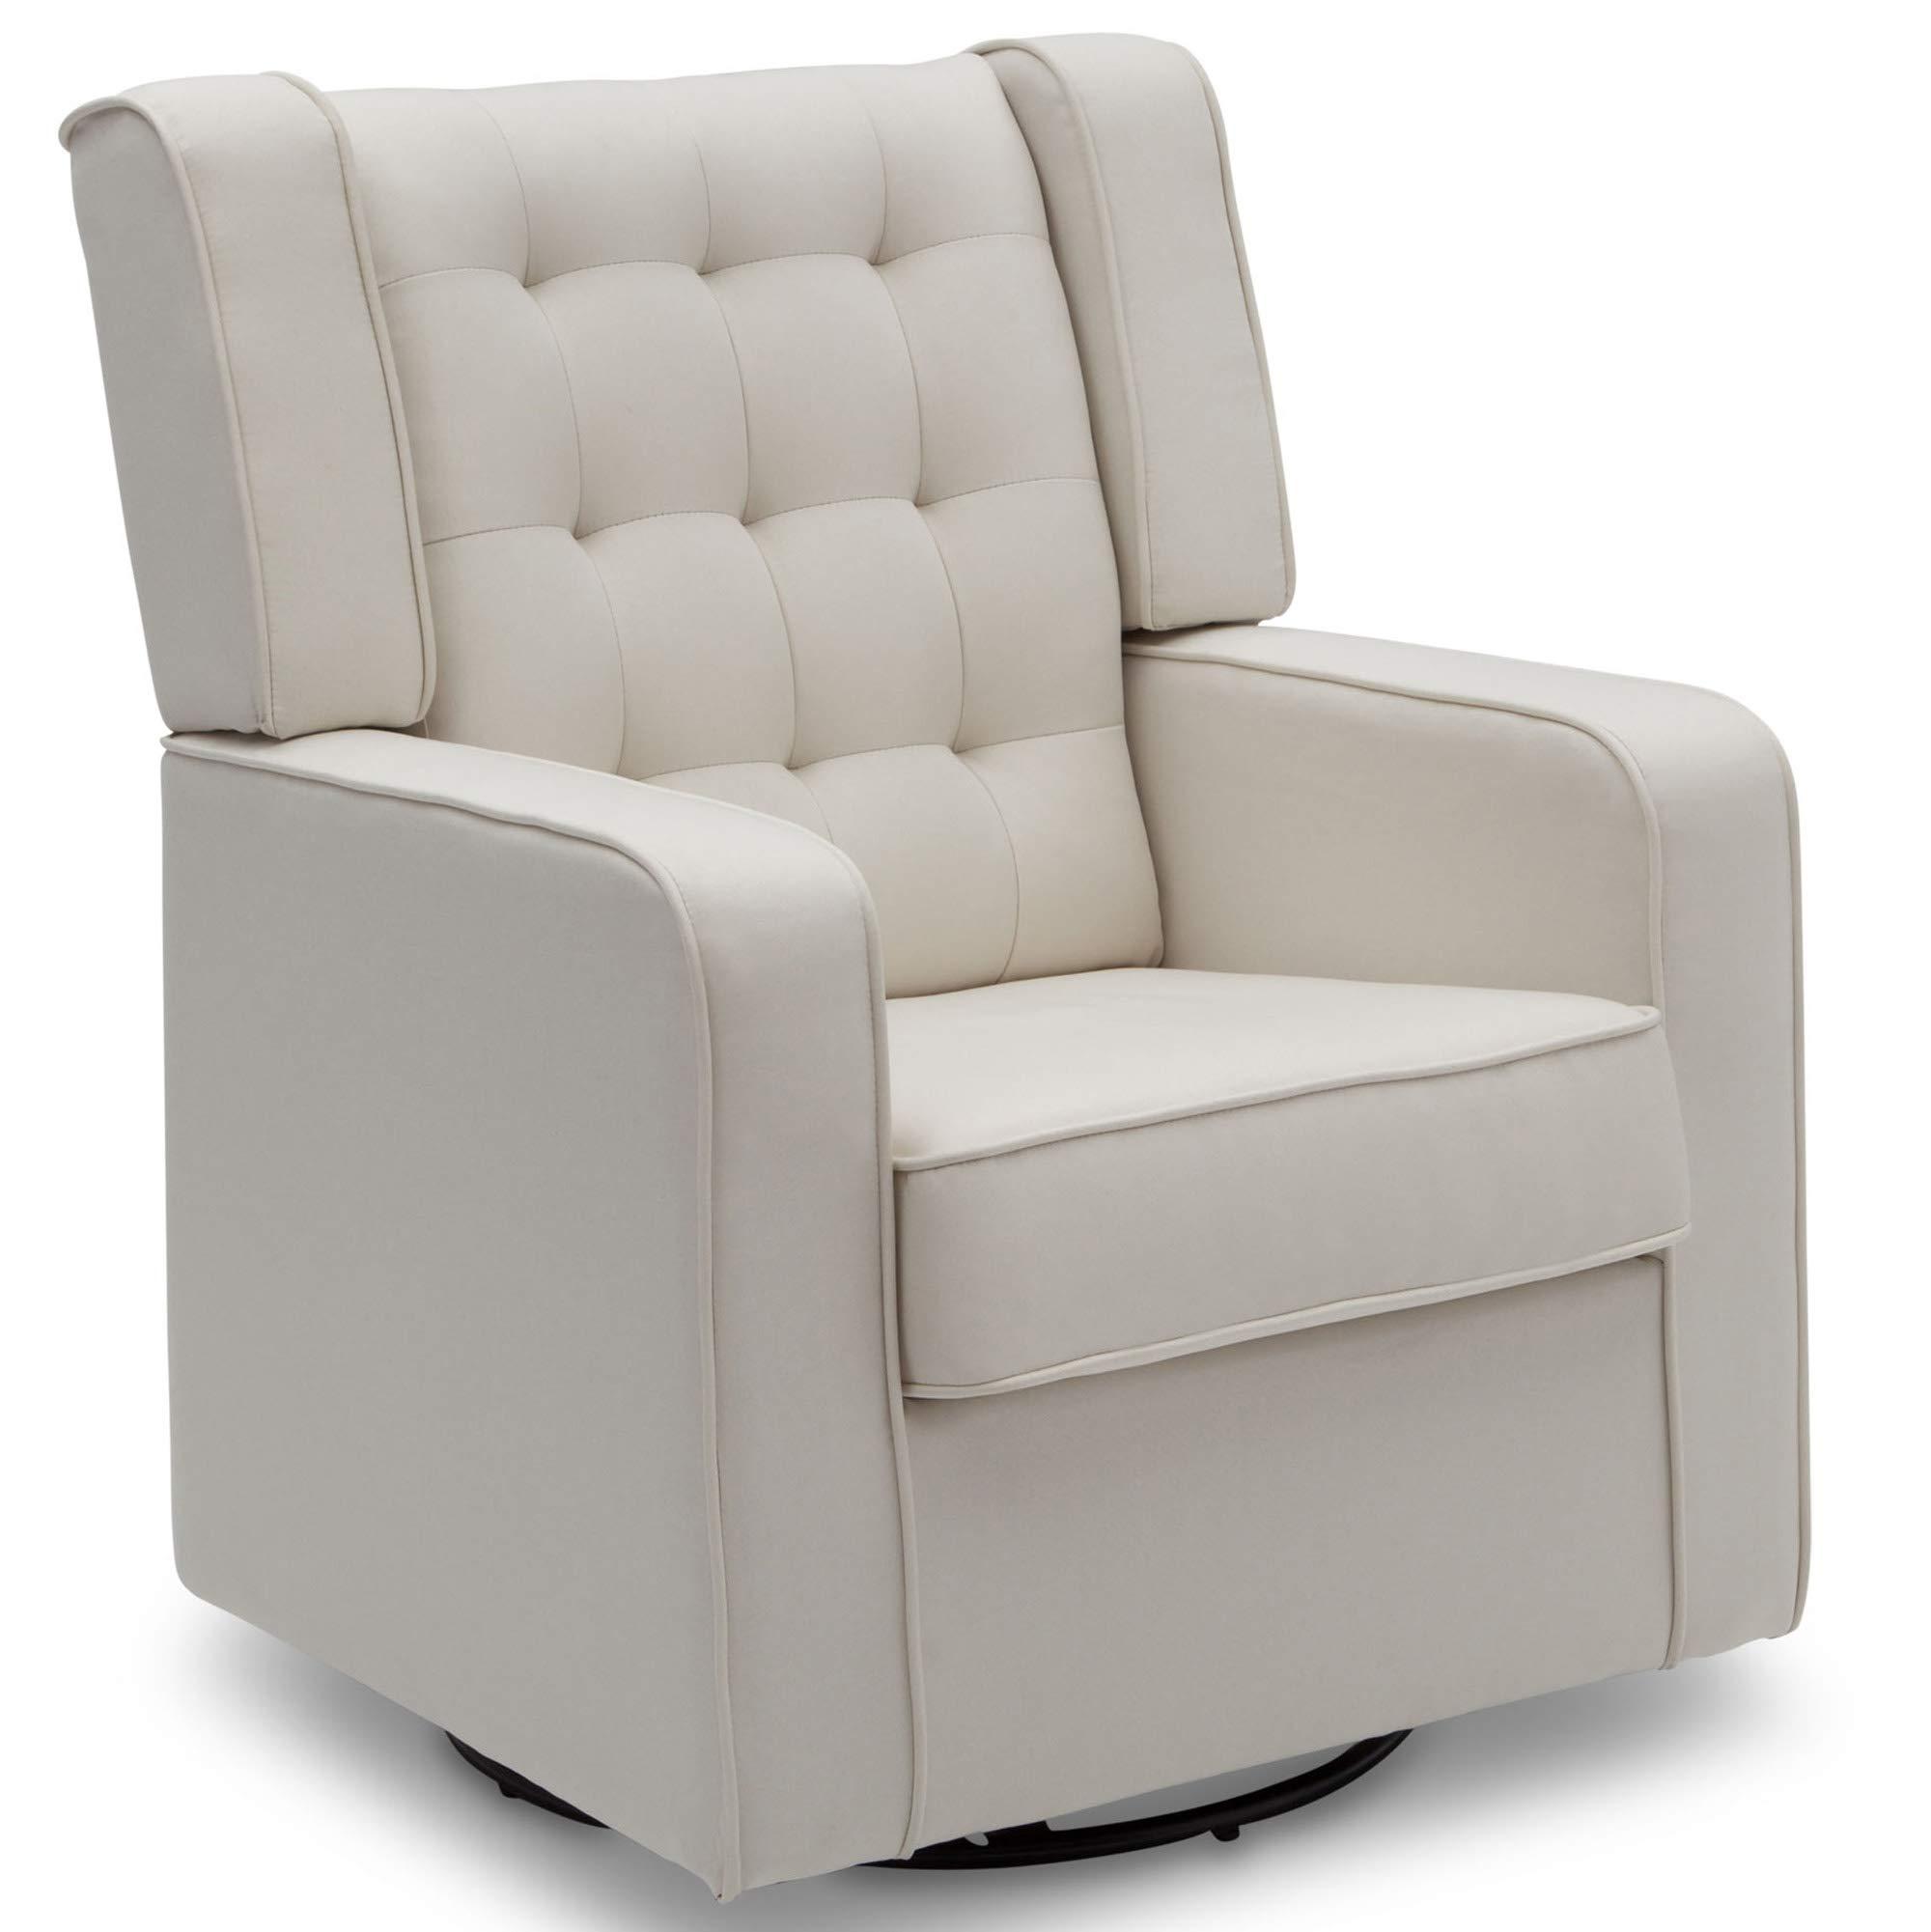 Delta Children Milan Upholstered Glider Swivel Rocker Chair, Cream